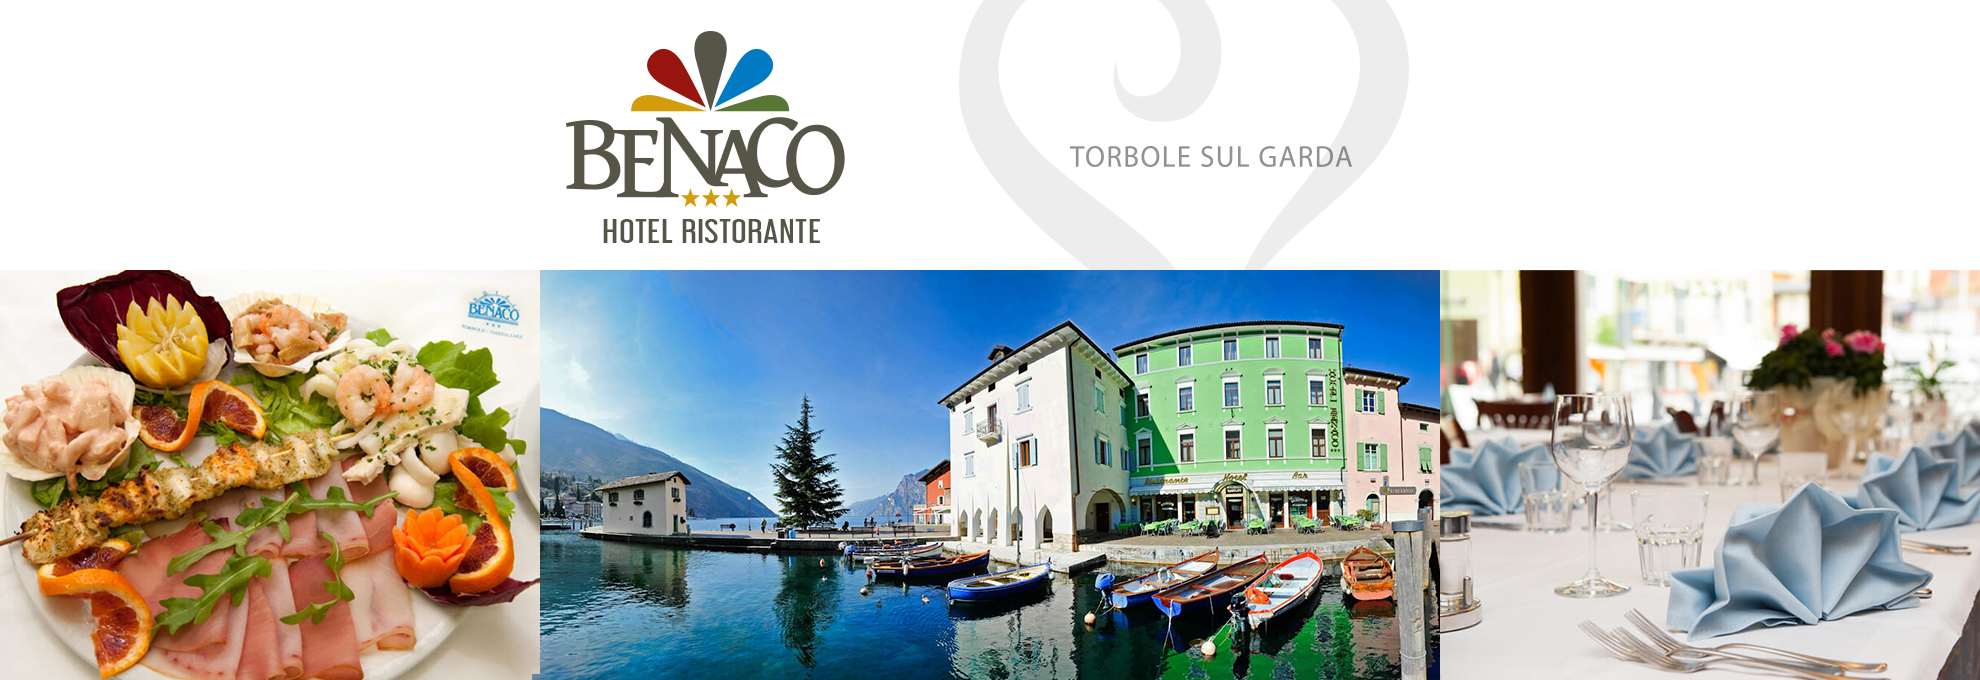 Benaco Hotel